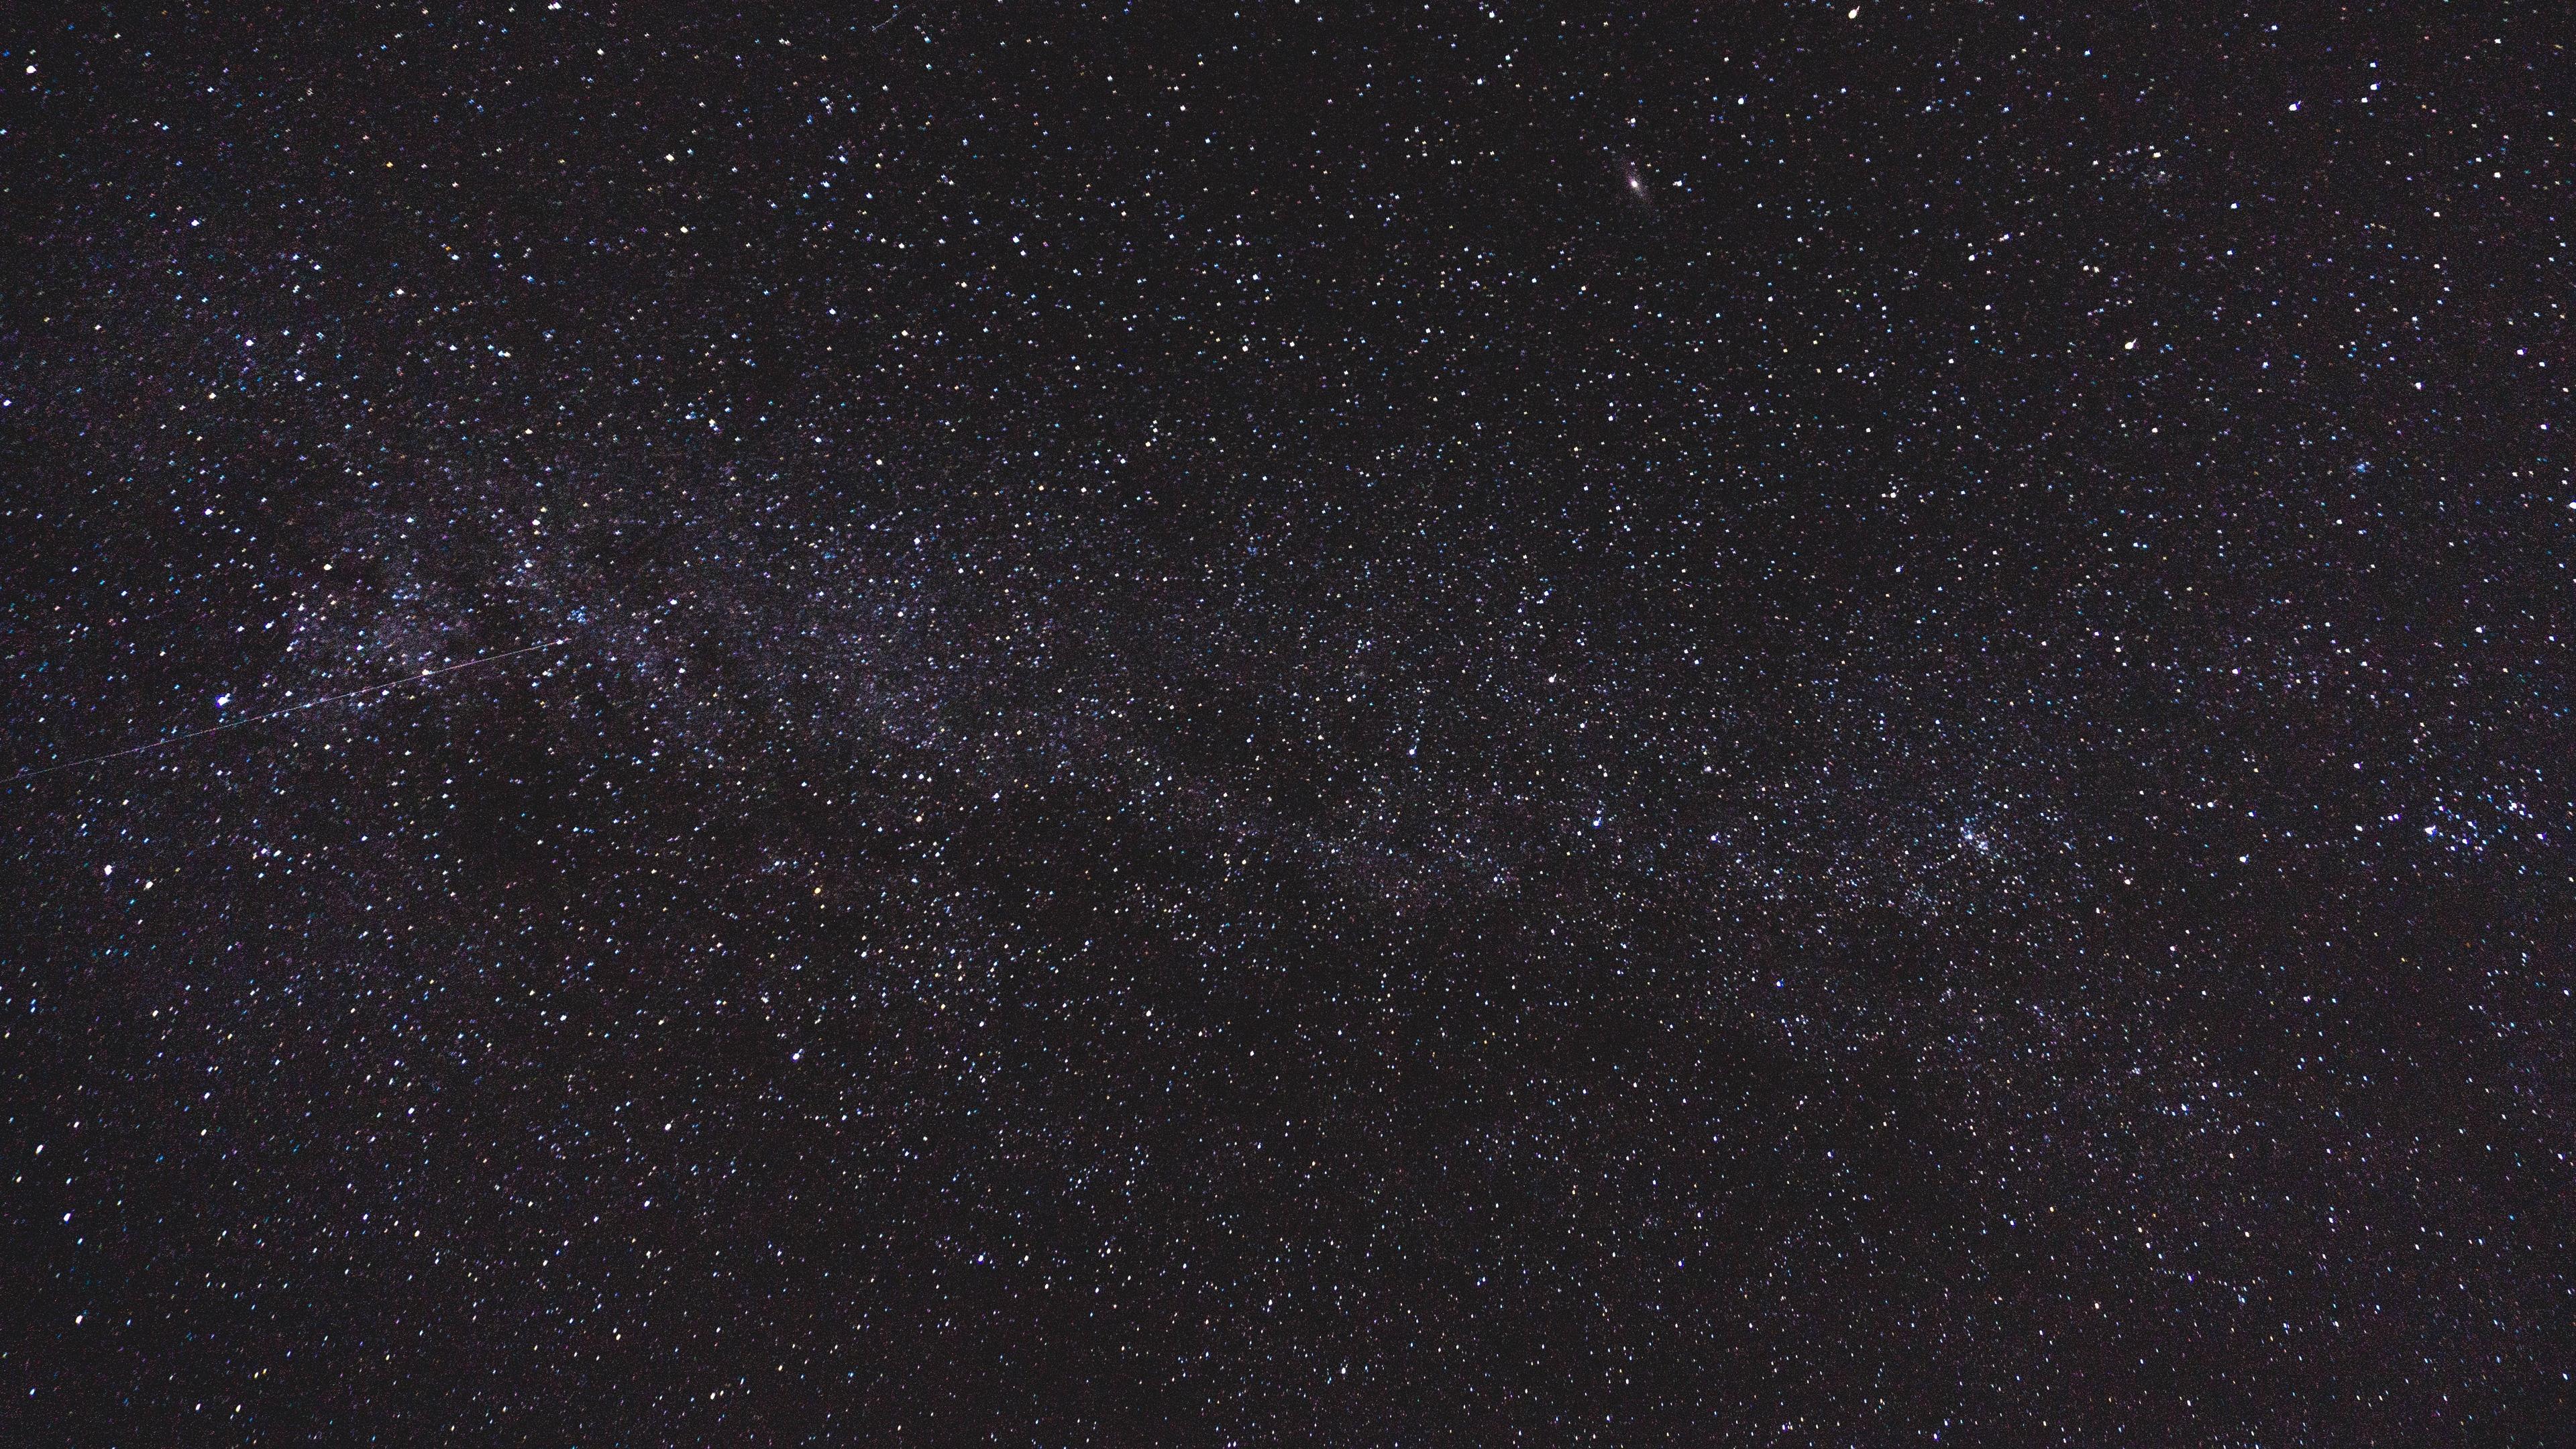 starry sky shine dark radiance 4k 1536016614 - starry sky, shine, dark, radiance 4k - starry sky, Shine, Dark